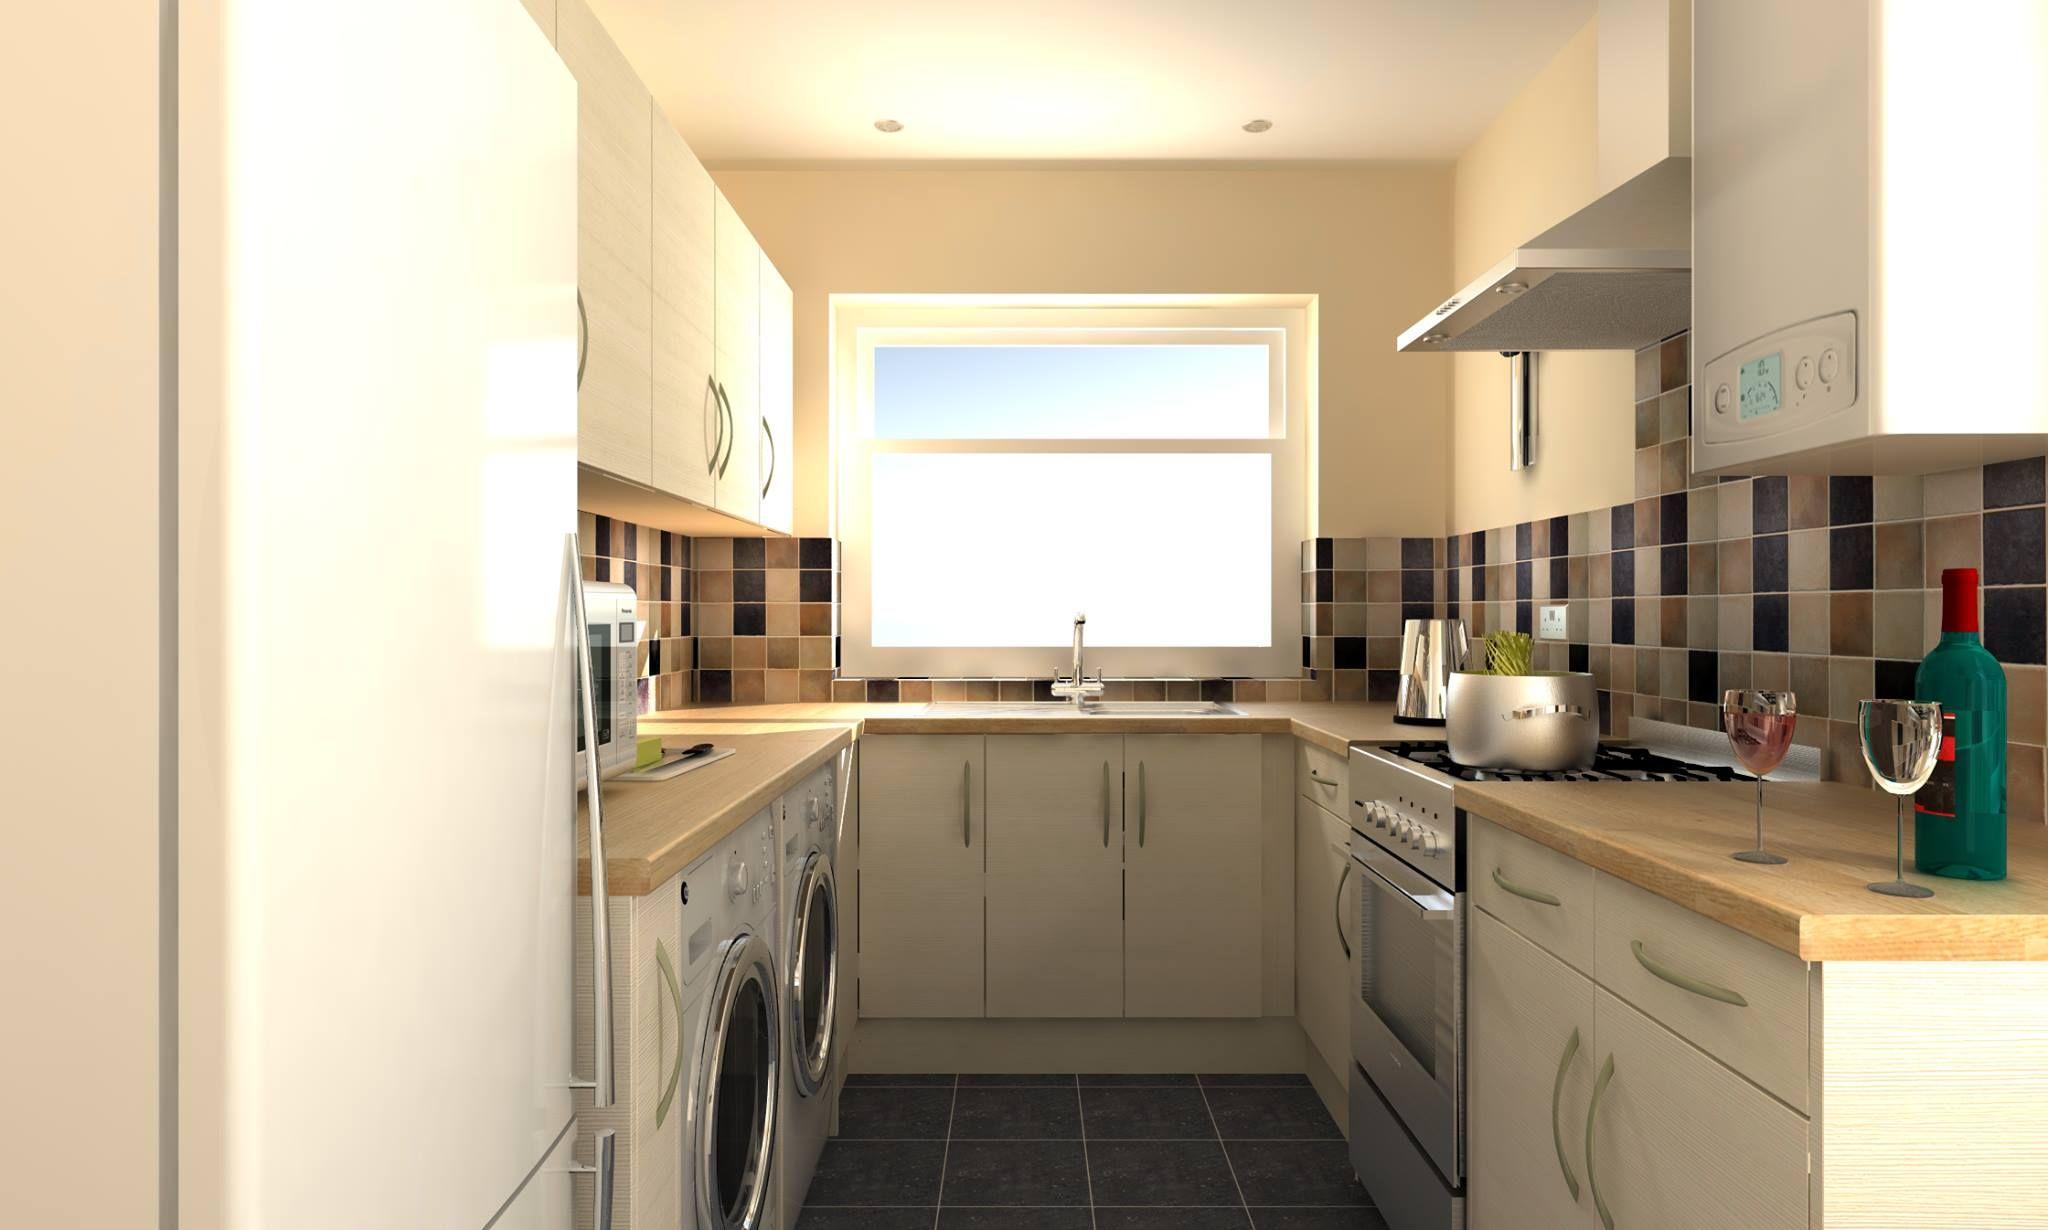 Kitchen Interior 3D Model/Rendering   Created By Darrel Carl Durose In  TurboCAD Pro Platinum